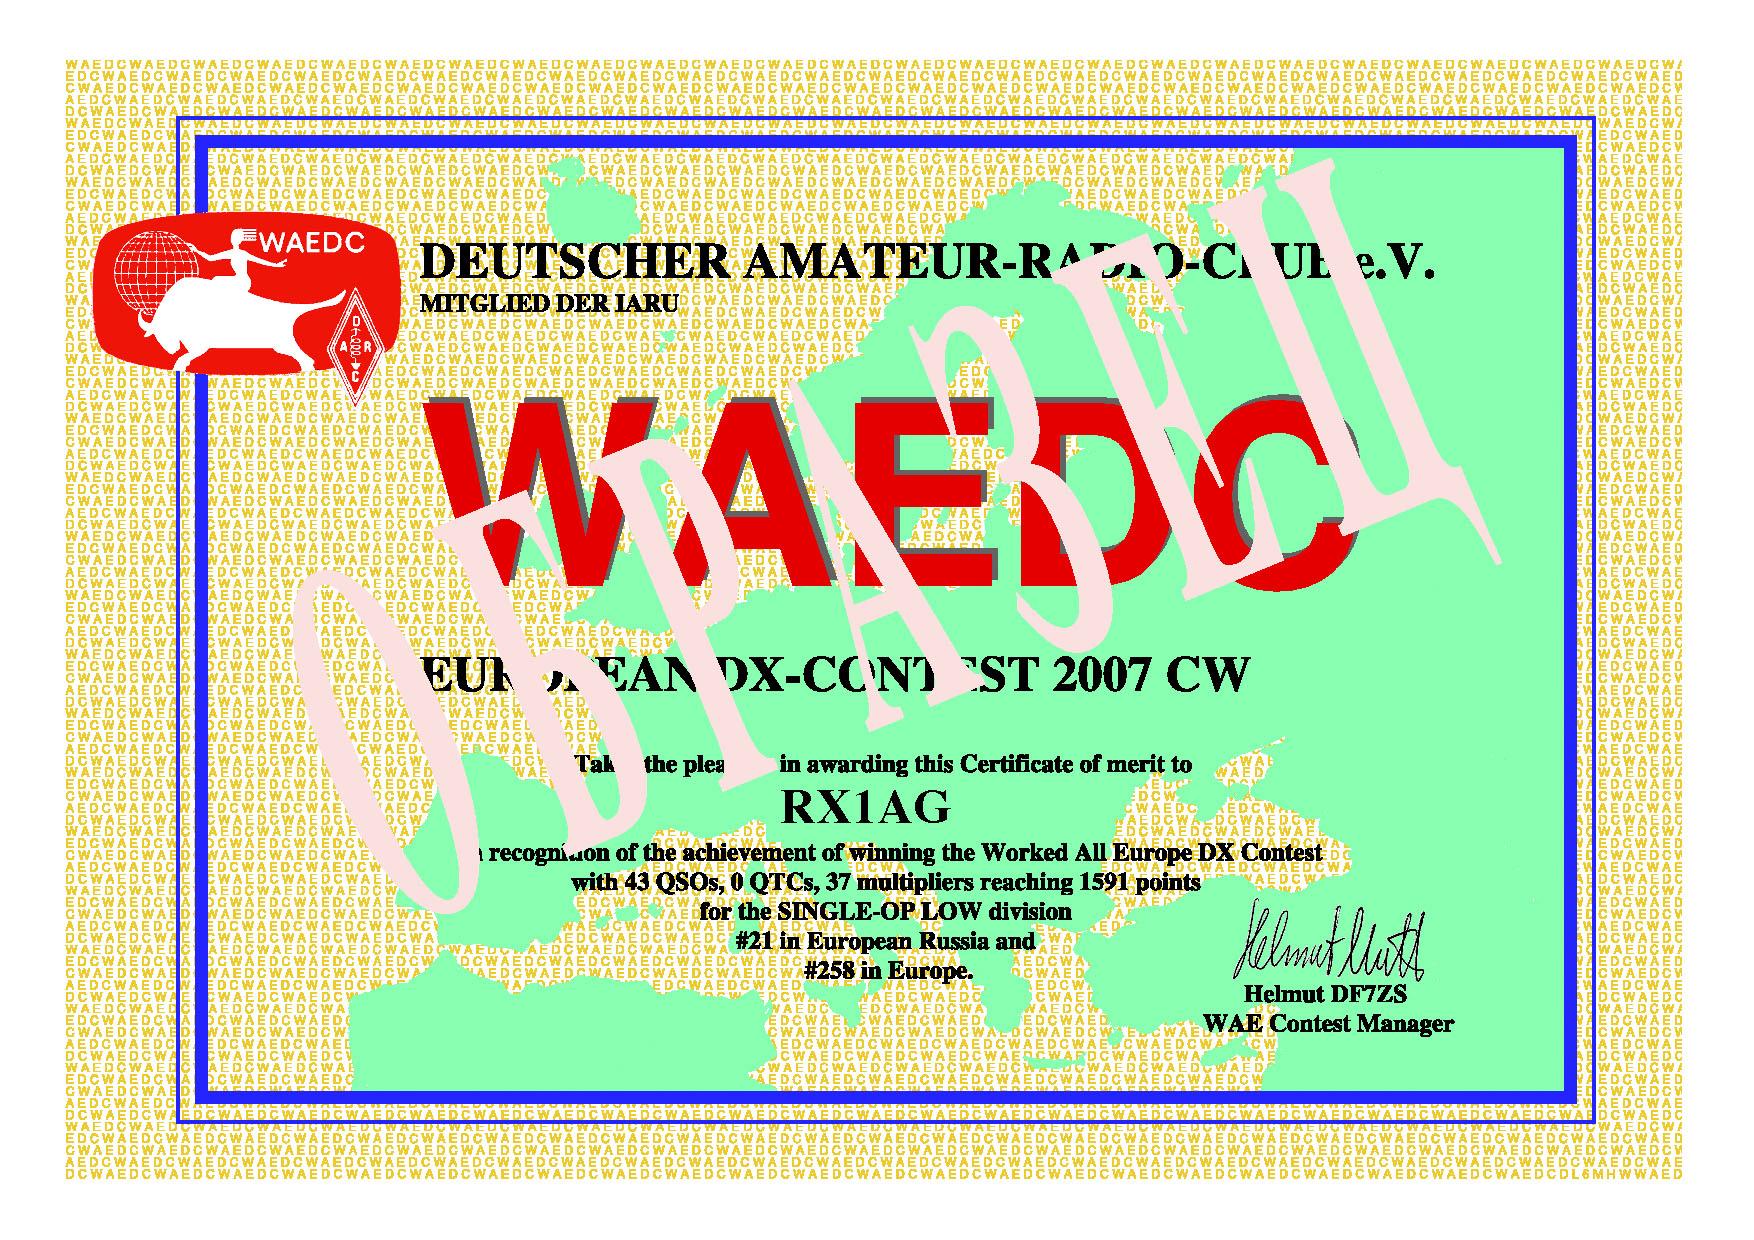 Нажмите на изображение для увеличения.  Название:doc_wae_01a.jpg Просмотров:105 Размер:935.6 Кб ID:93412